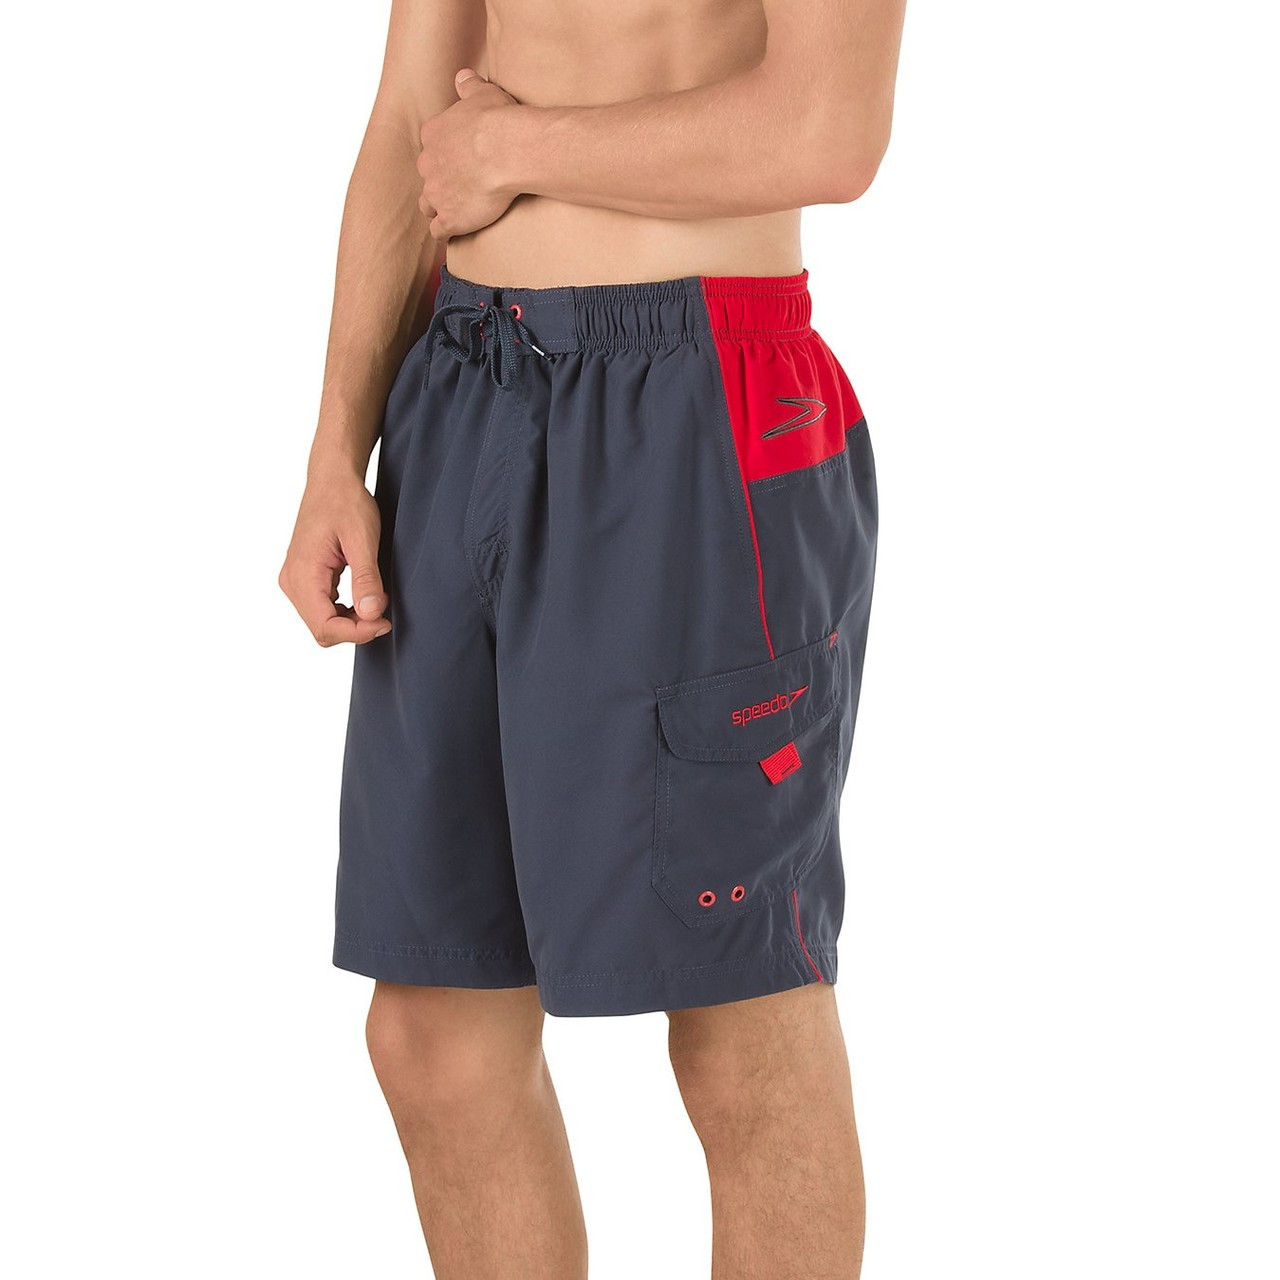 89f76b0ed4 Speedo Men's Sport Volley Swim Trunk